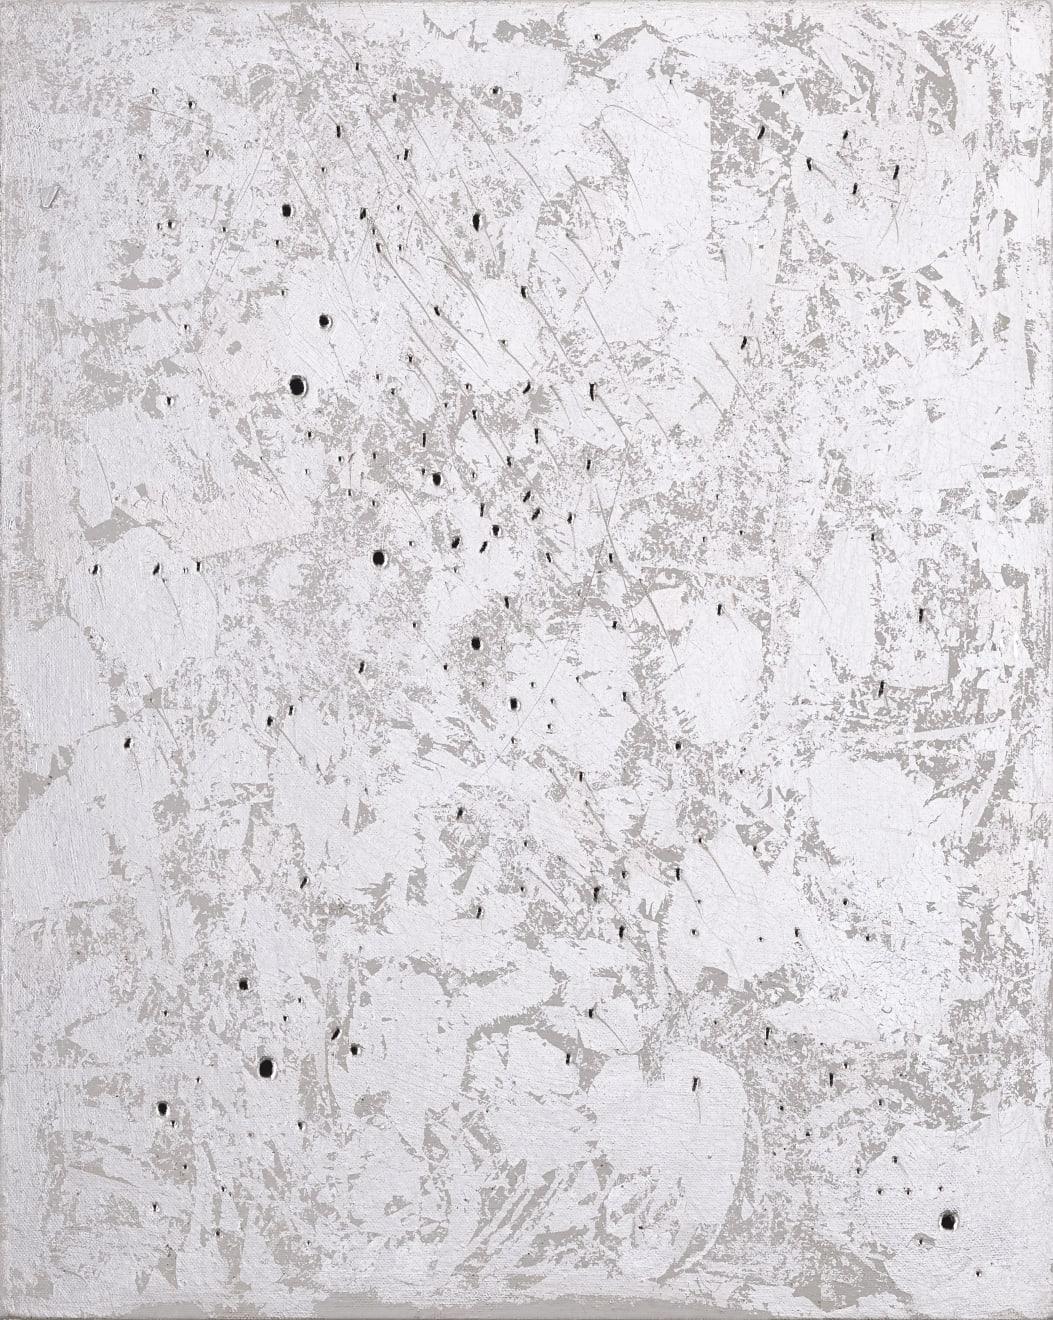 Jennifer Douglas, Entropic Cosmos (Silver I), 2019